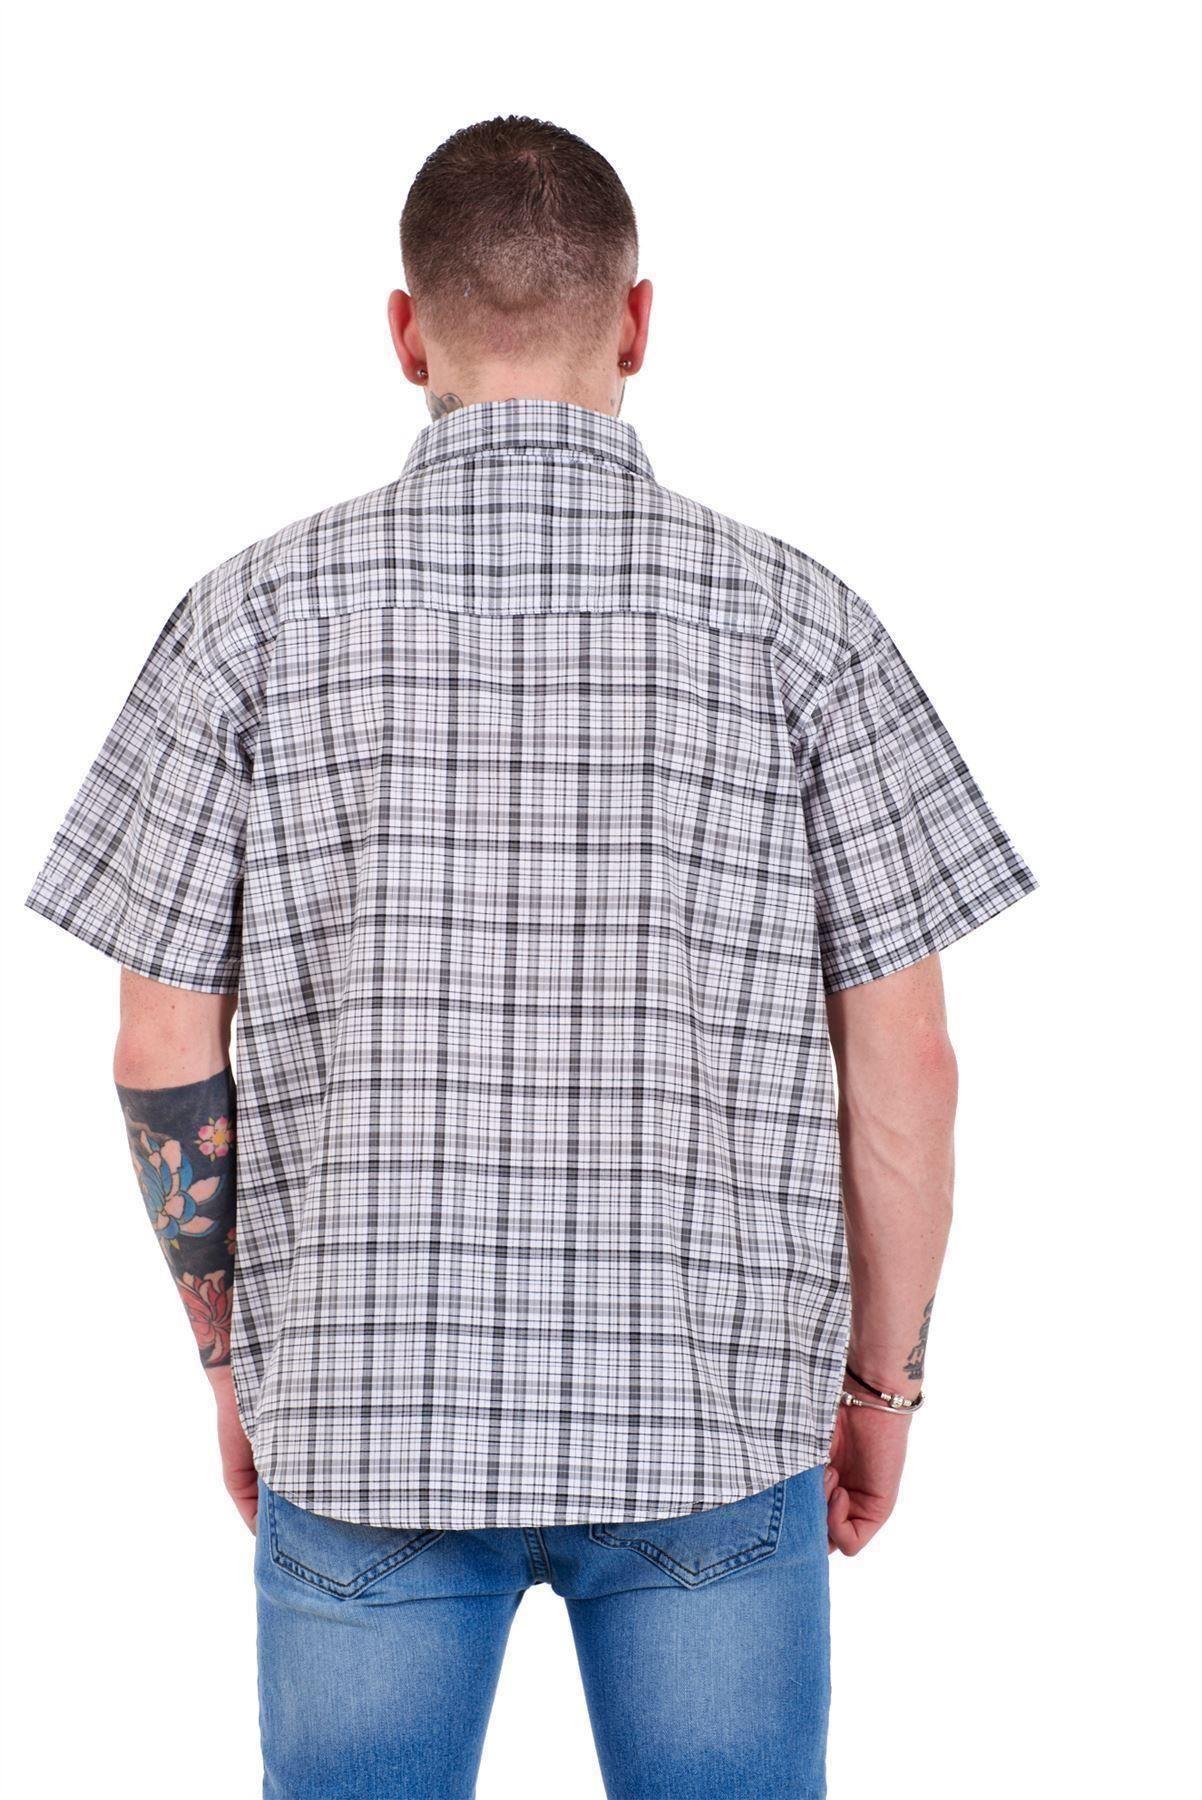 Mens-Regular-Big-Size-Shirts-Checked-Cotton-Blend-Casual-Short-Sleeve-M-to-5XL thumbnail 17